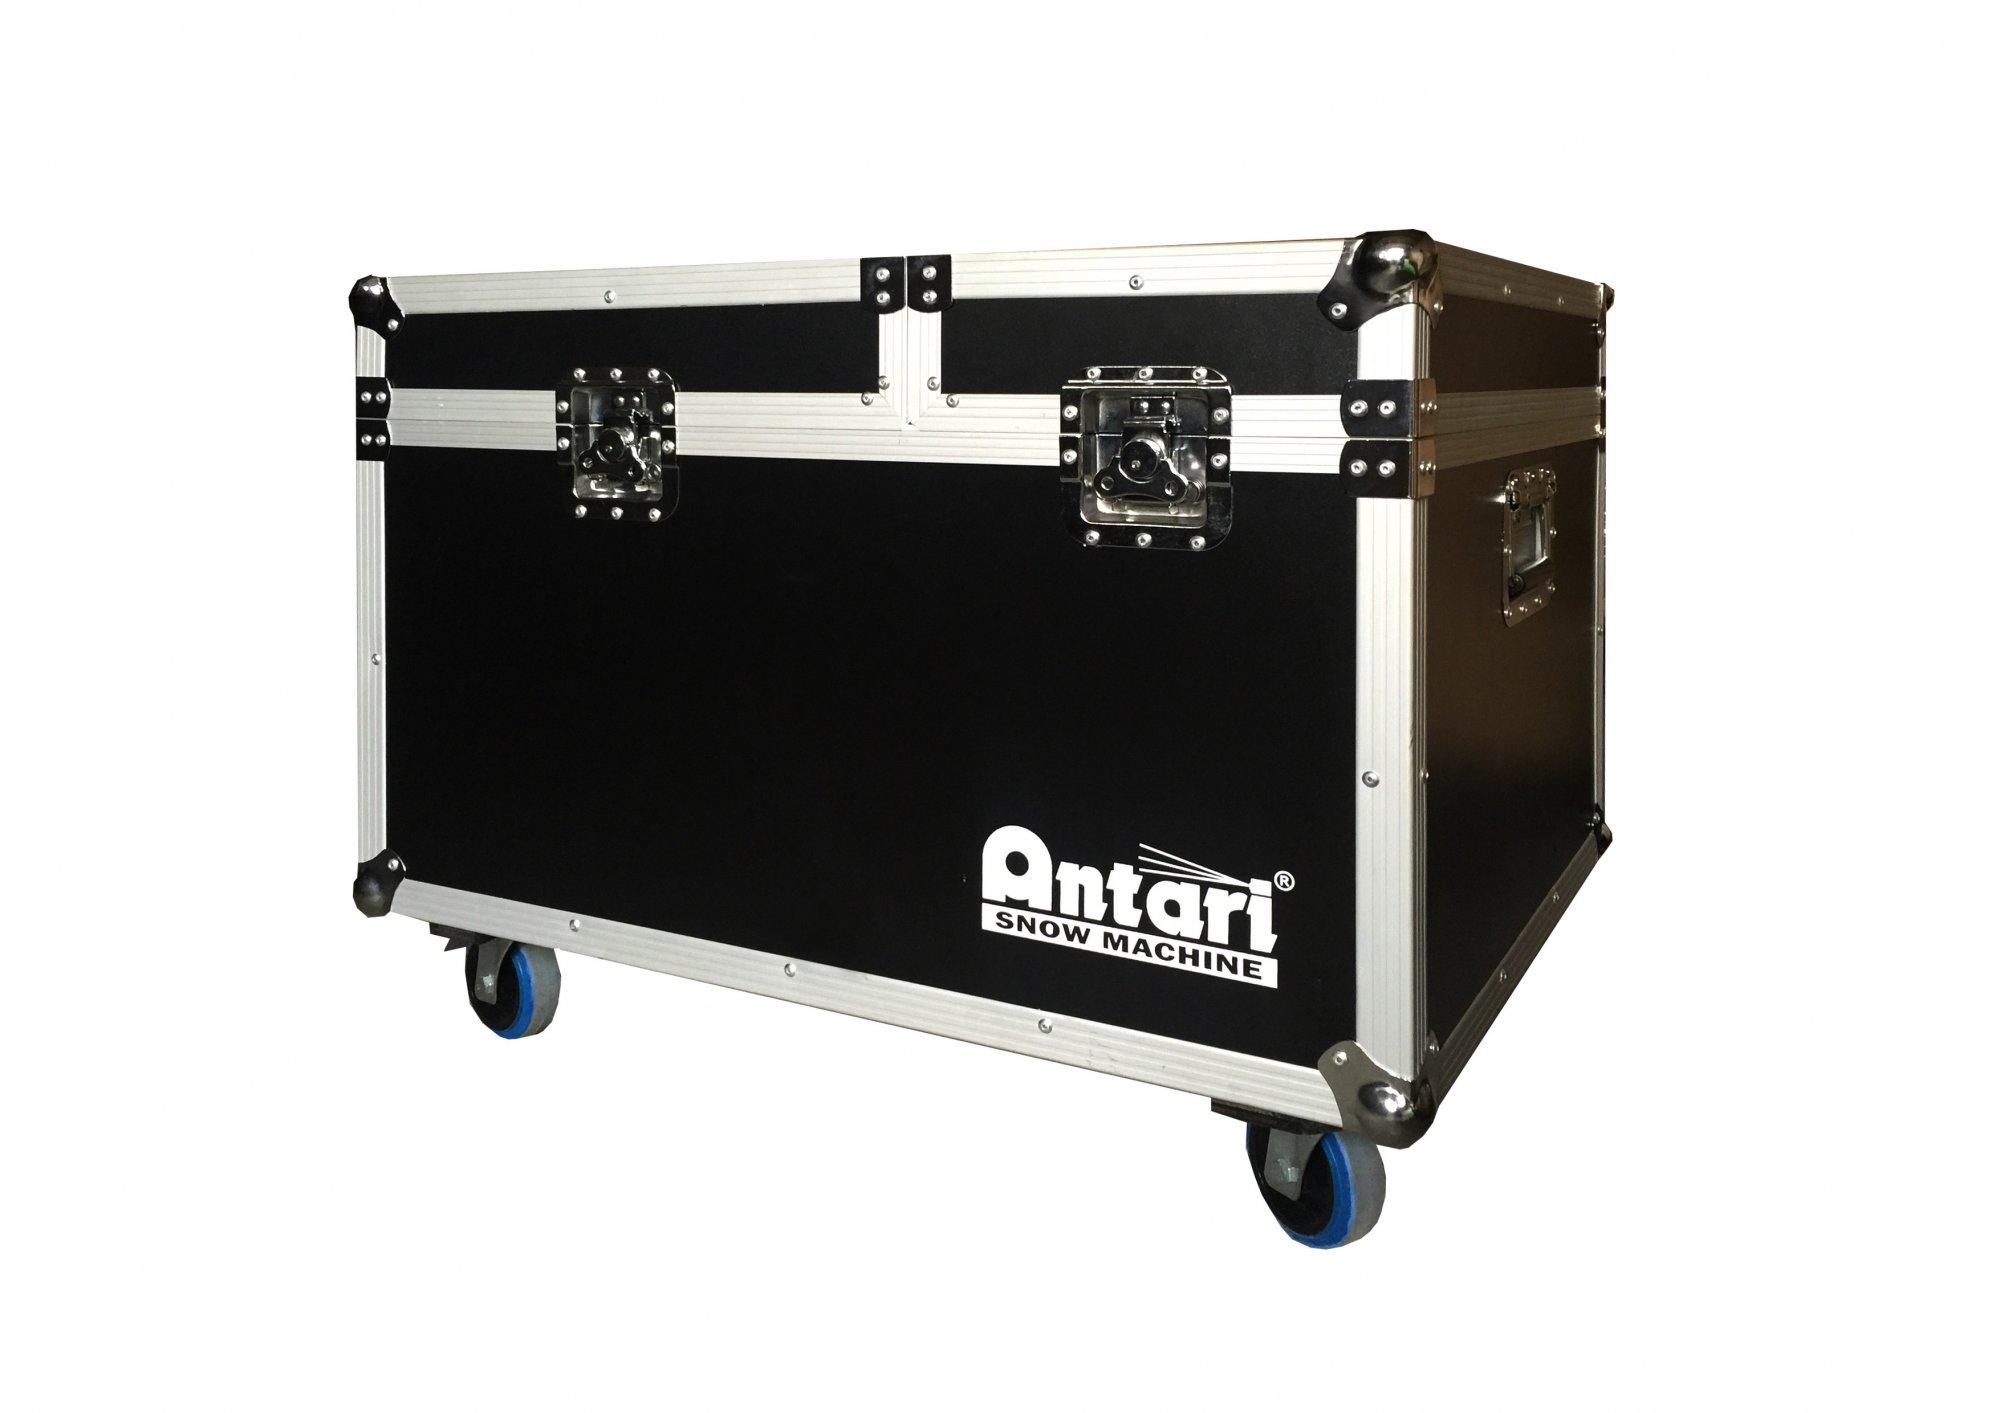 Antari S500DLX Snow Machine Package - High Volume, Touring, WDMX